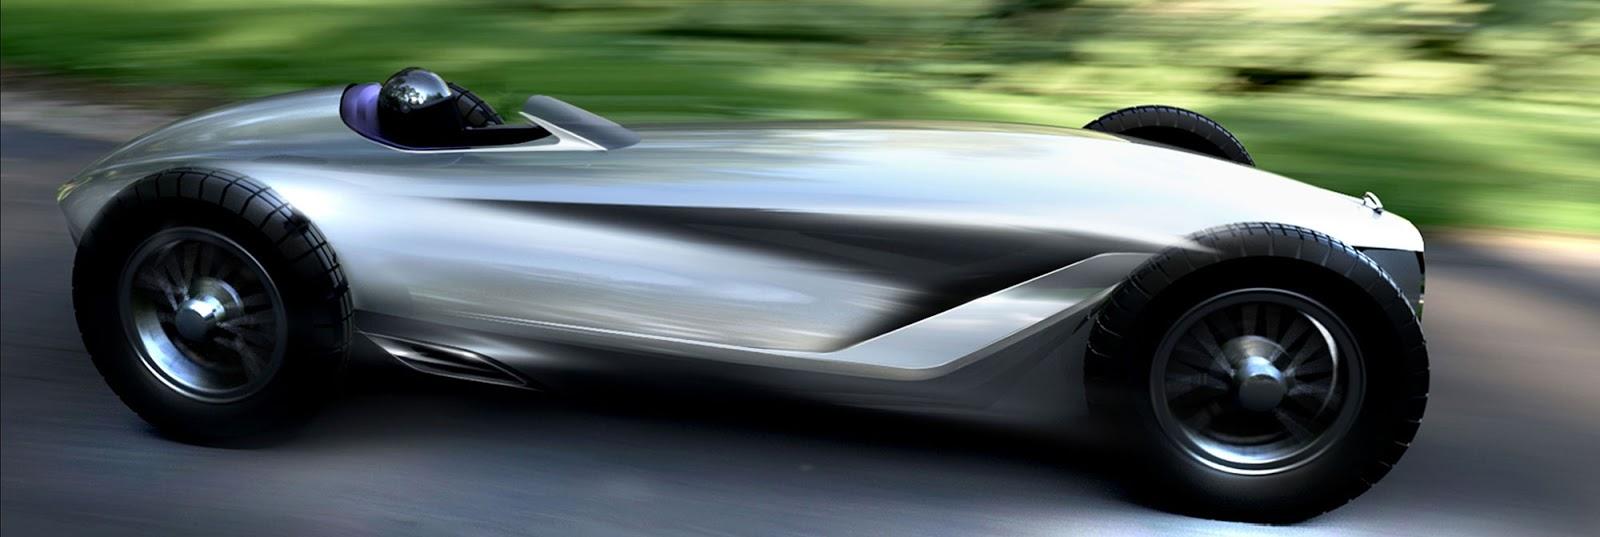 Infiniti Prototype 9 render, side view racing